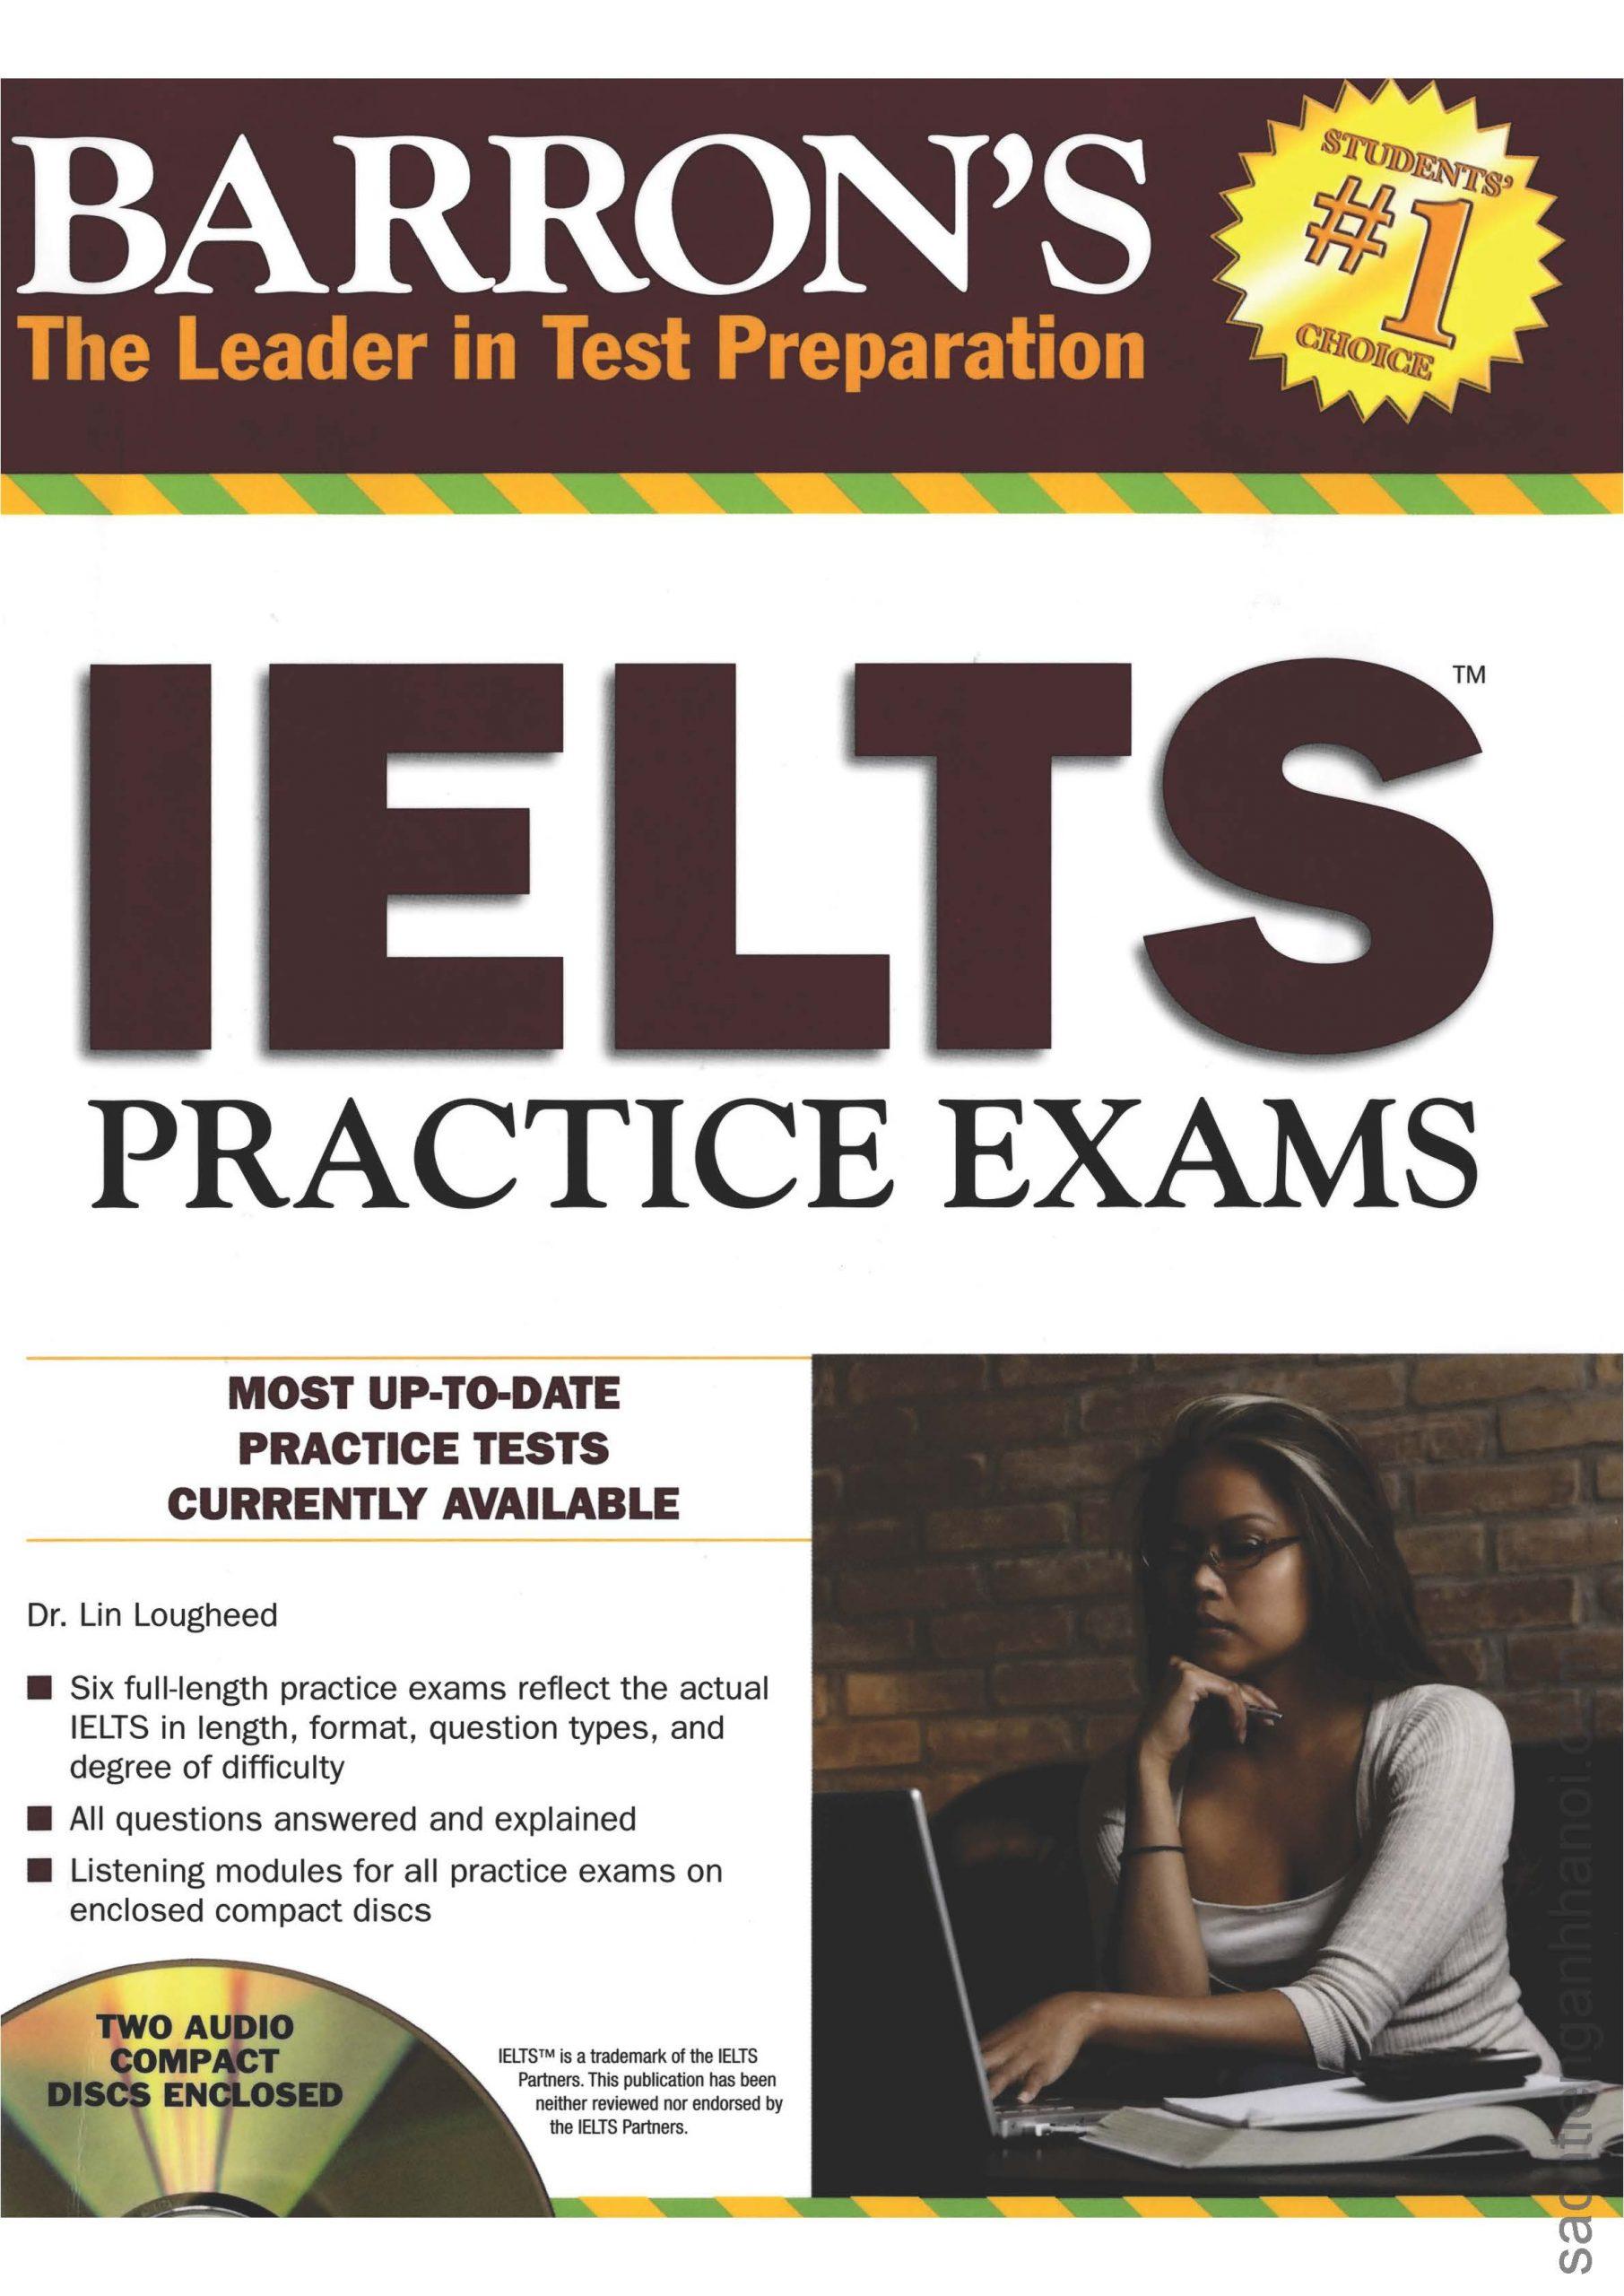 Audio] Barron's IELTS Practice Exams – SÁCH TIẾNG ANH HÀ NỘI